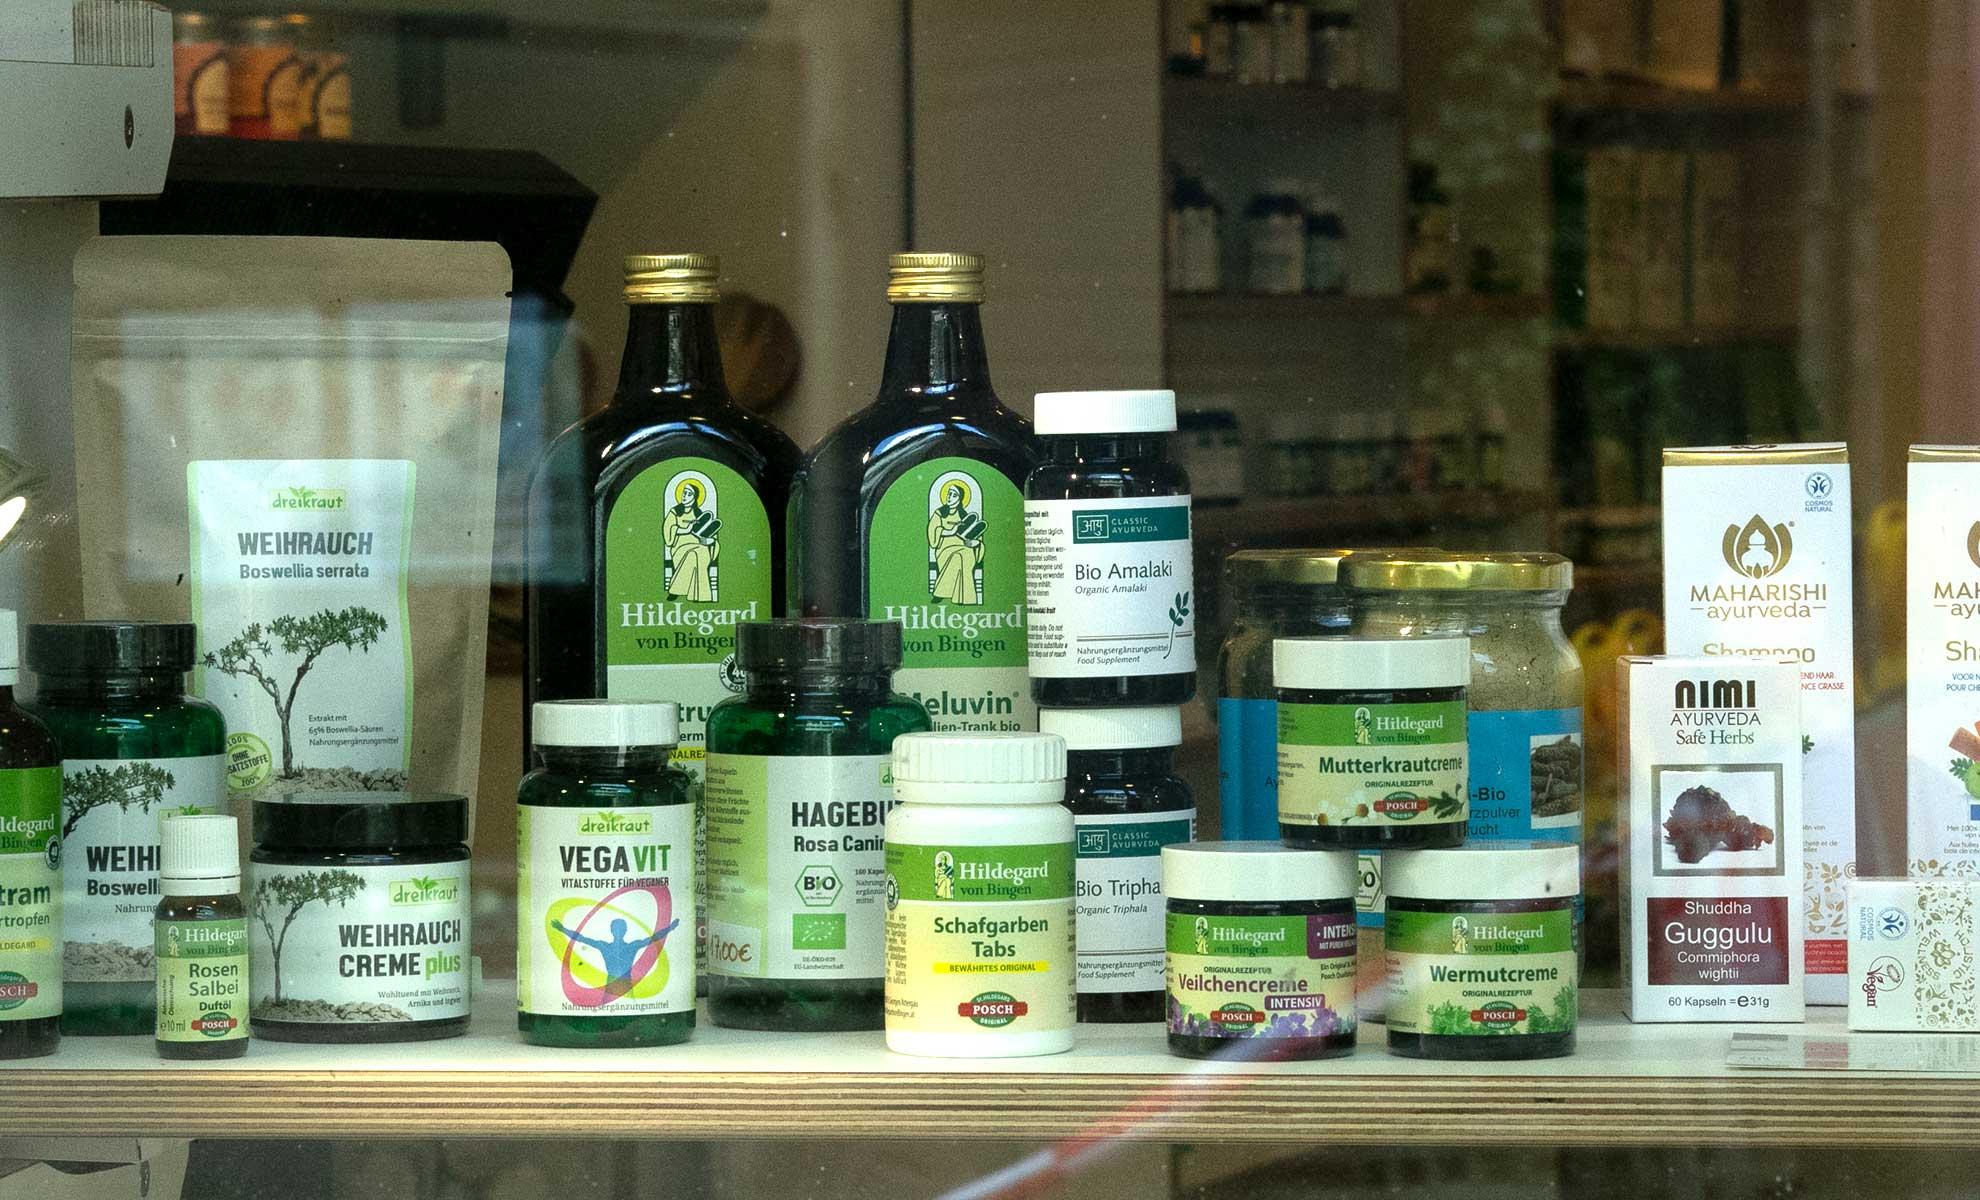 Ayurvedica-Ayurveda-Bamberg-Lockdown-Karo23-Produkte-Maharishi-Ayurveda-Hildegard-von-Bingen-Web